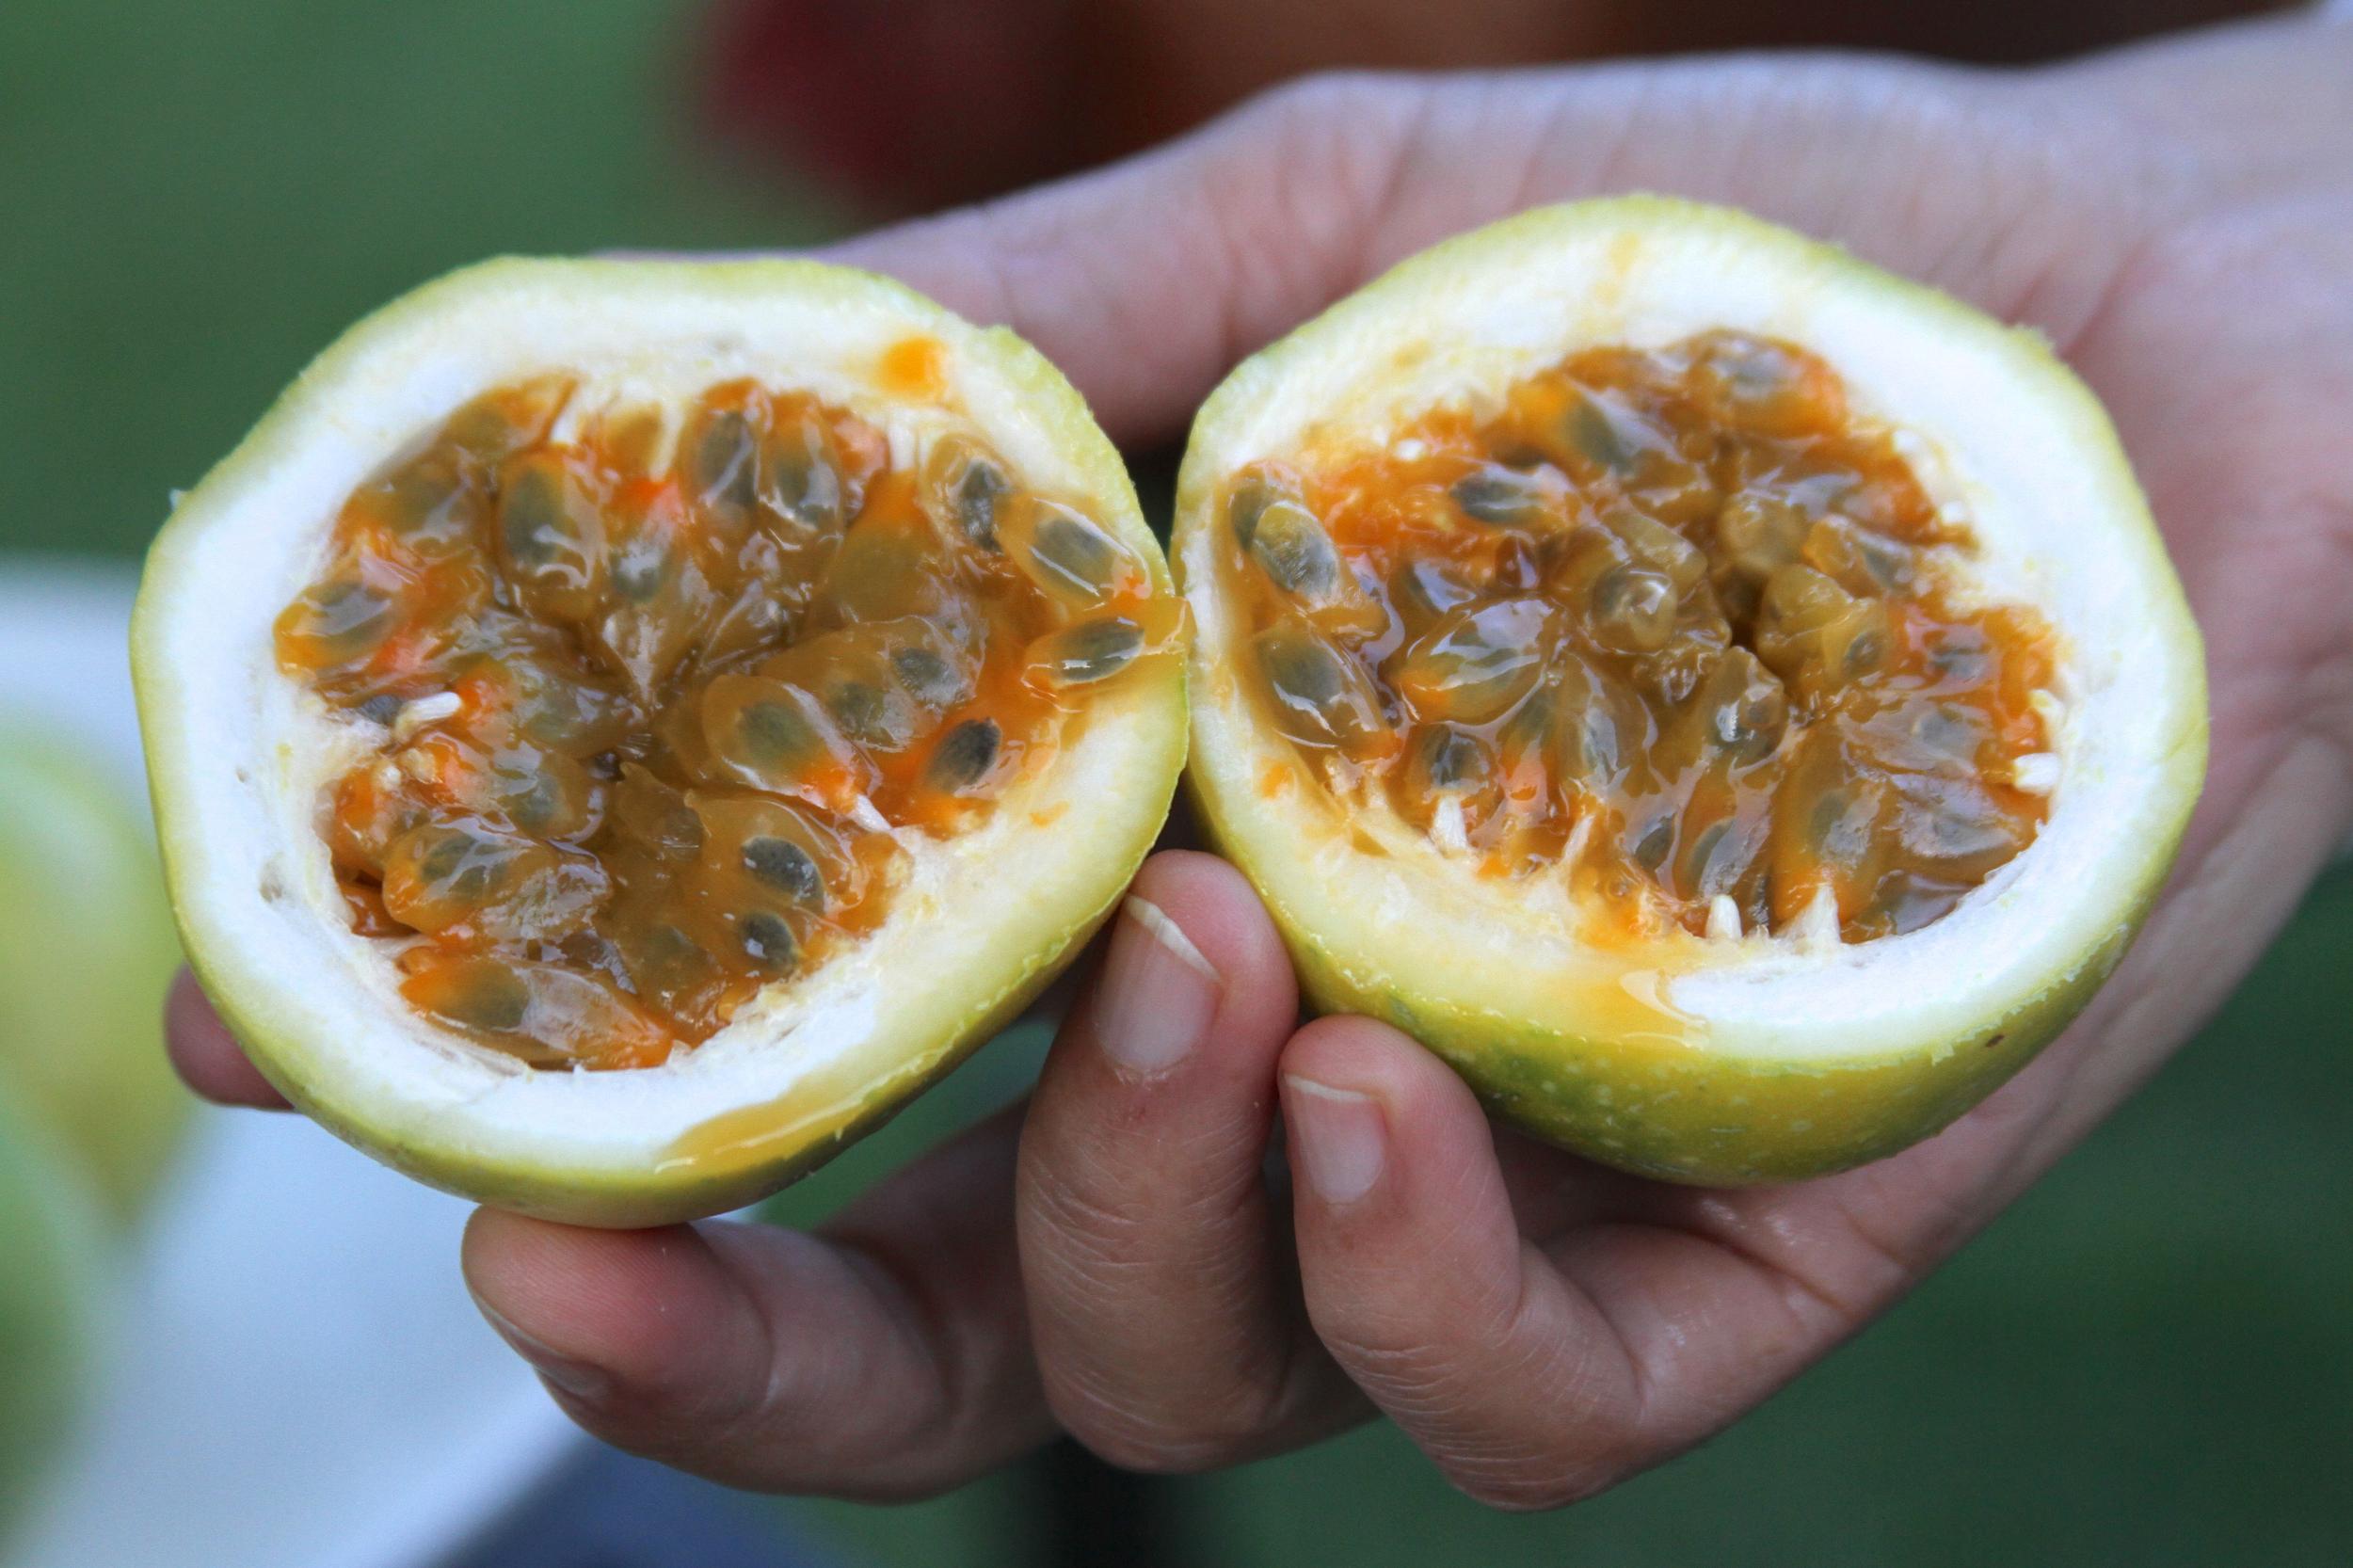 kenyapassionfruit2.jpg